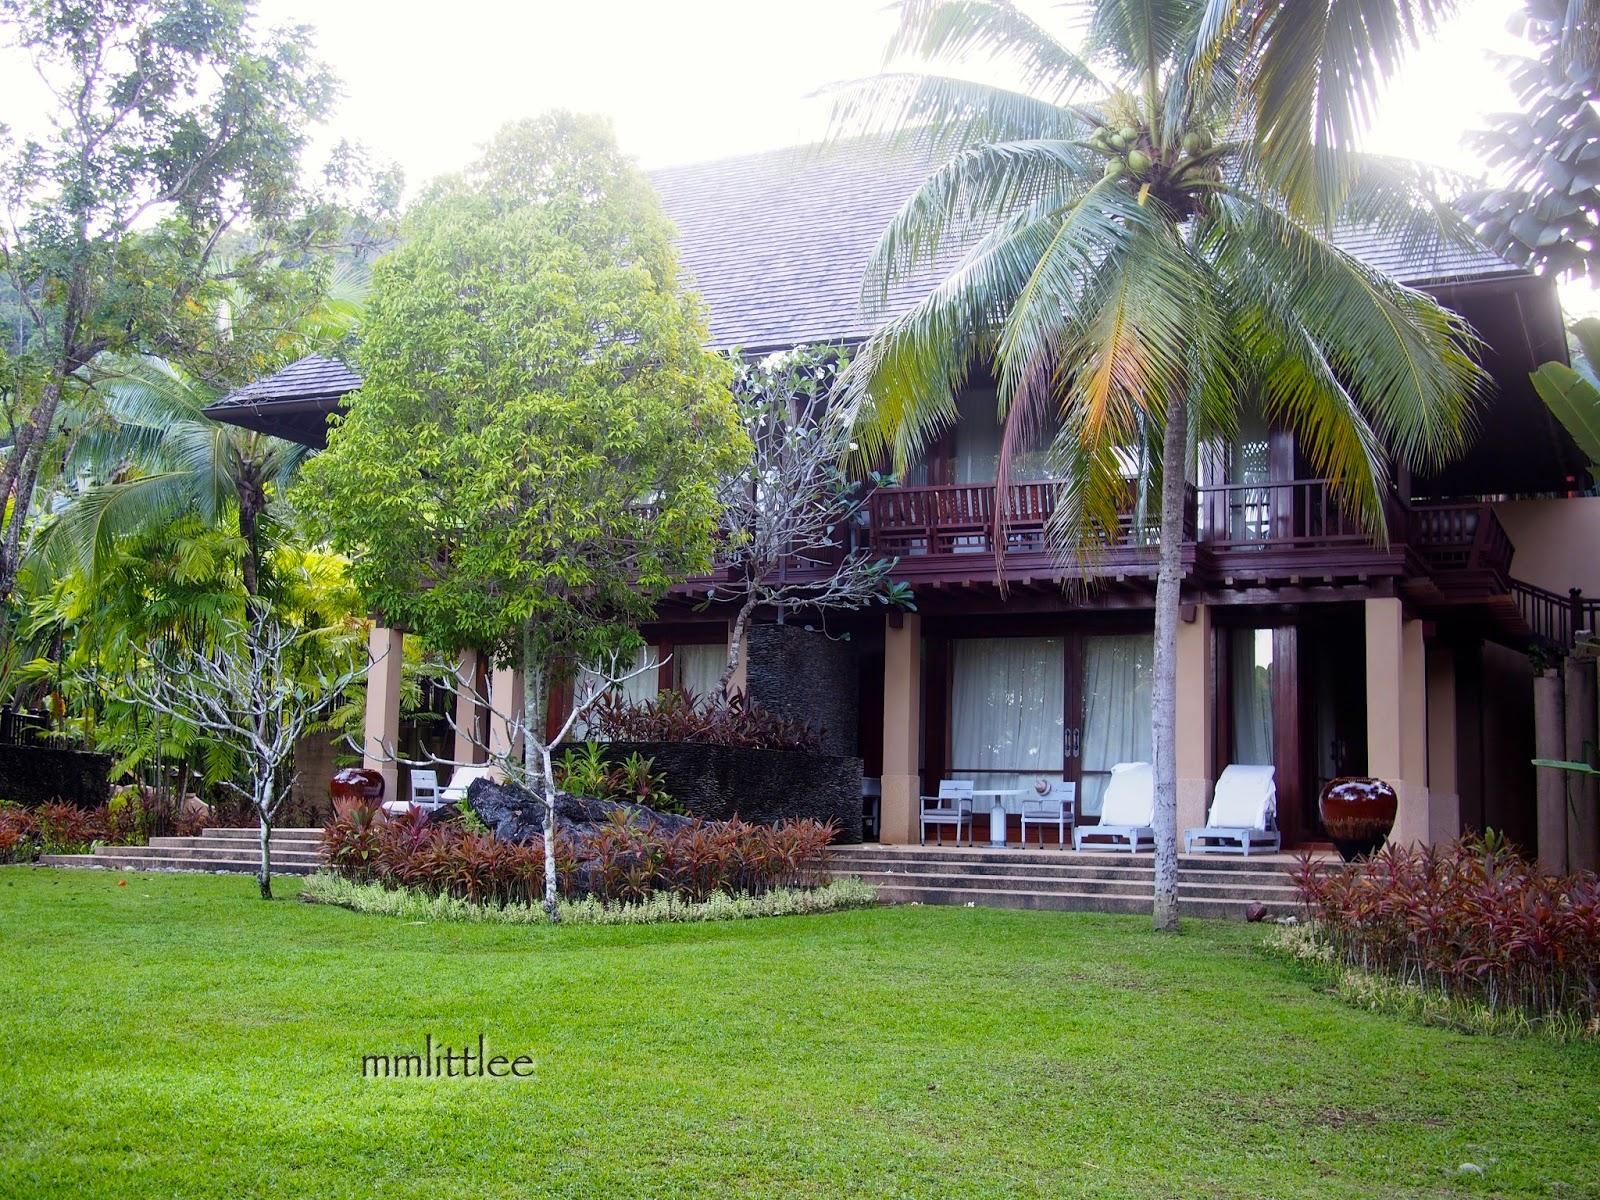 The Destination: Four Seasons Resort Langkawi | a million little echoes